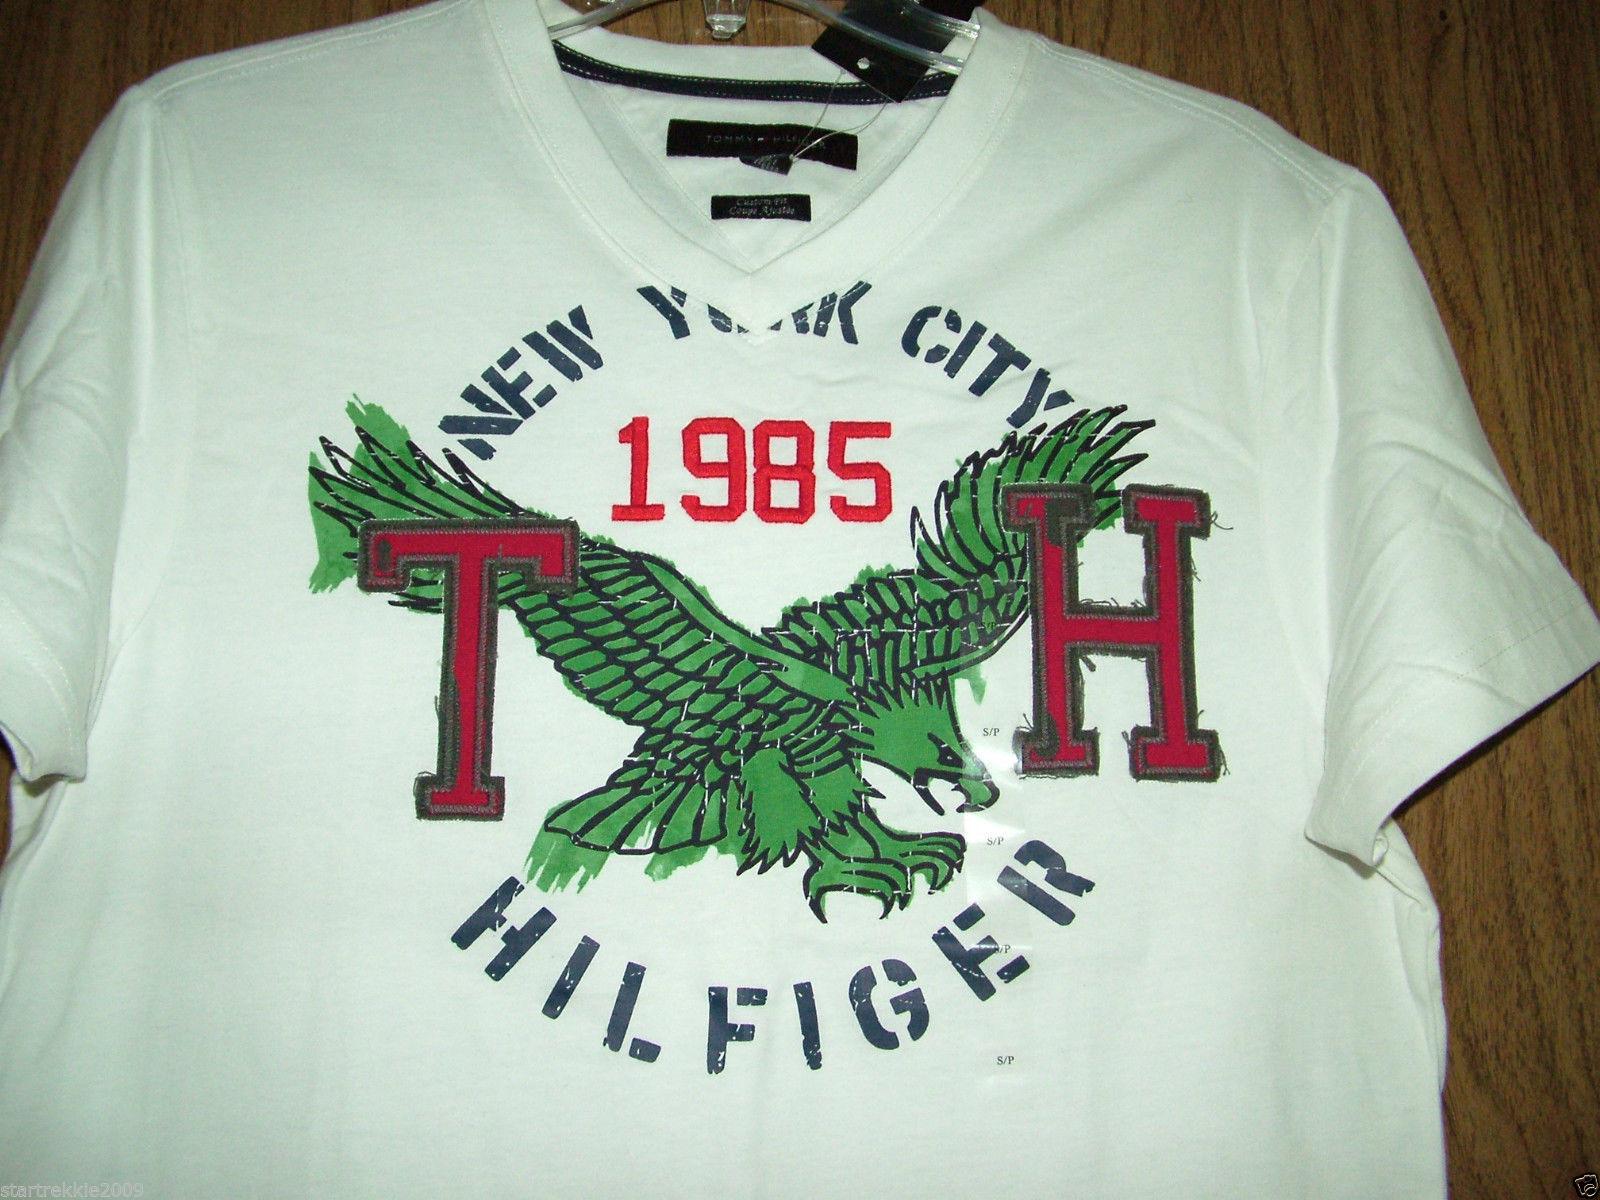 Tommy Hilfiger Eagle/Logo Mens Tshirt, White Color, Sz.Small. NWT.100% Authentic